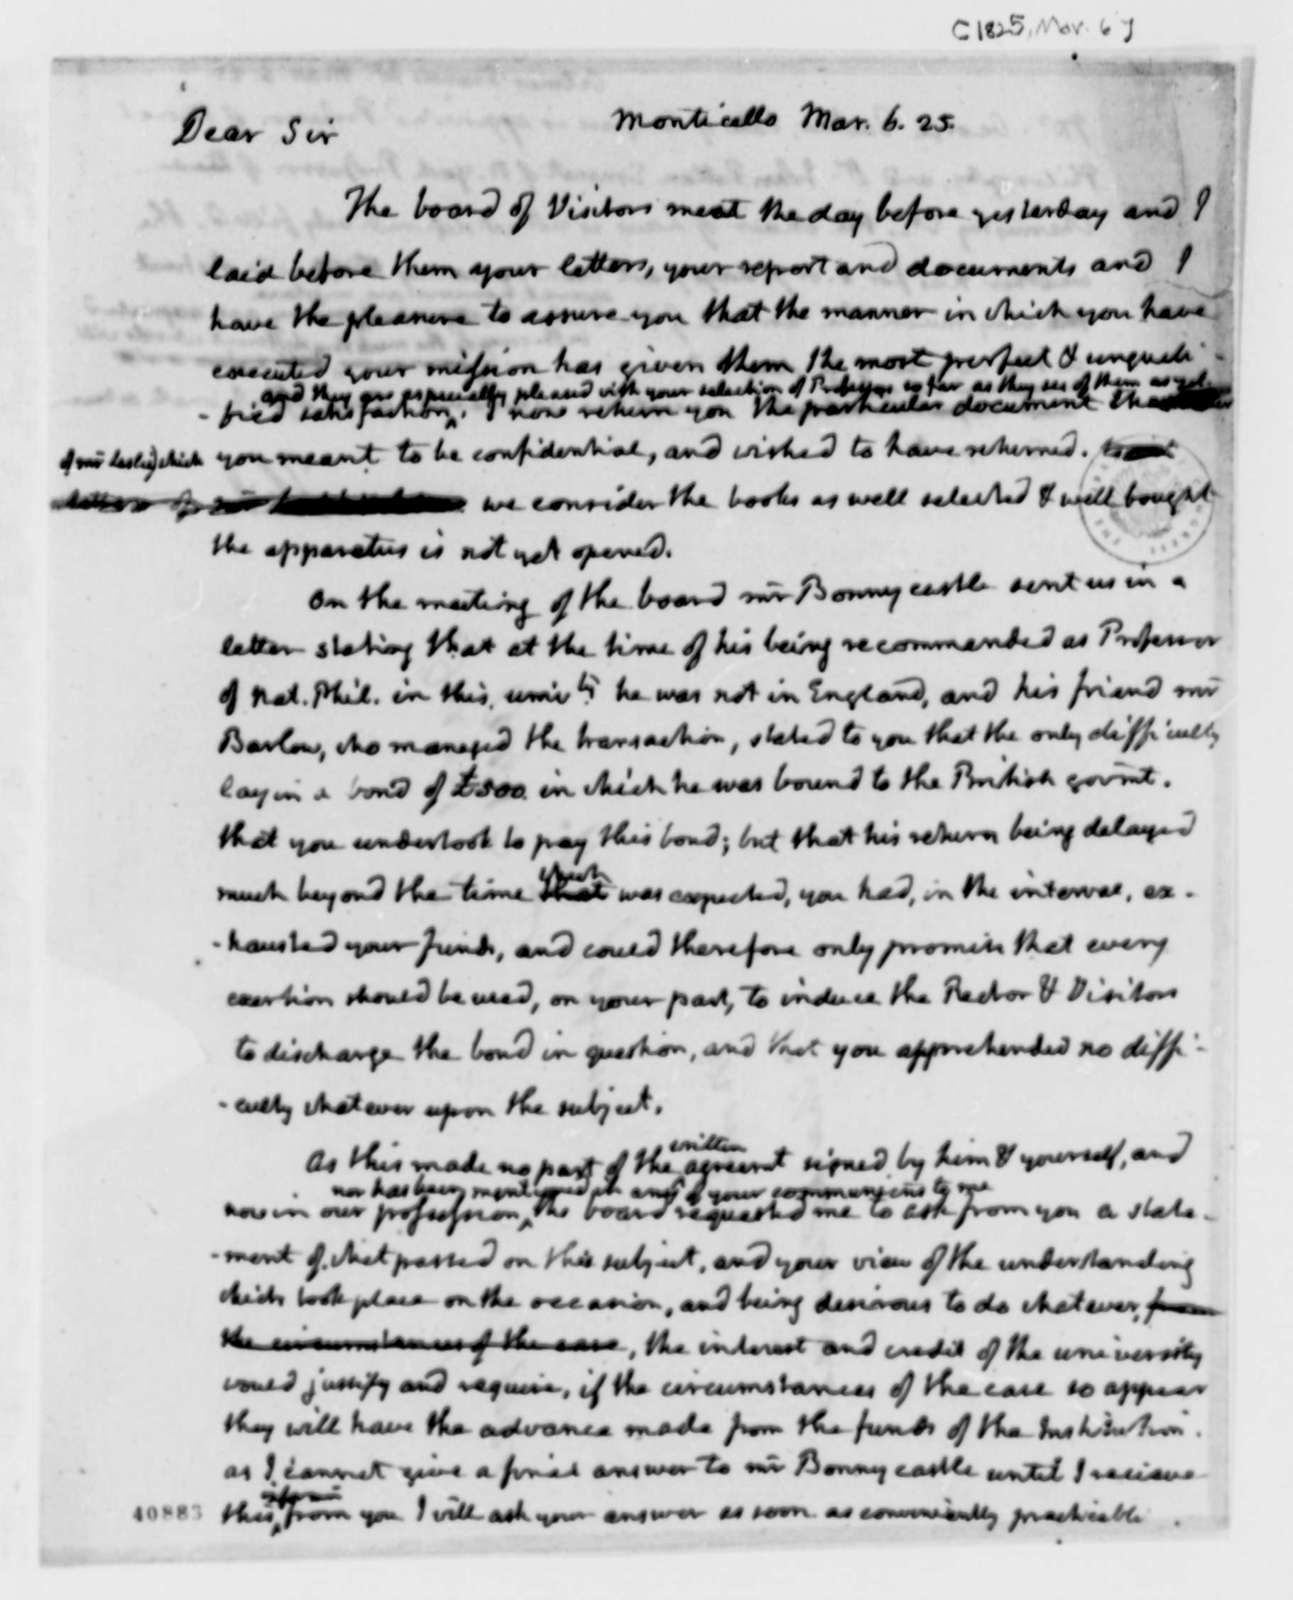 Francis W. Gilmer to Thomas Jefferson, March 6, 1825